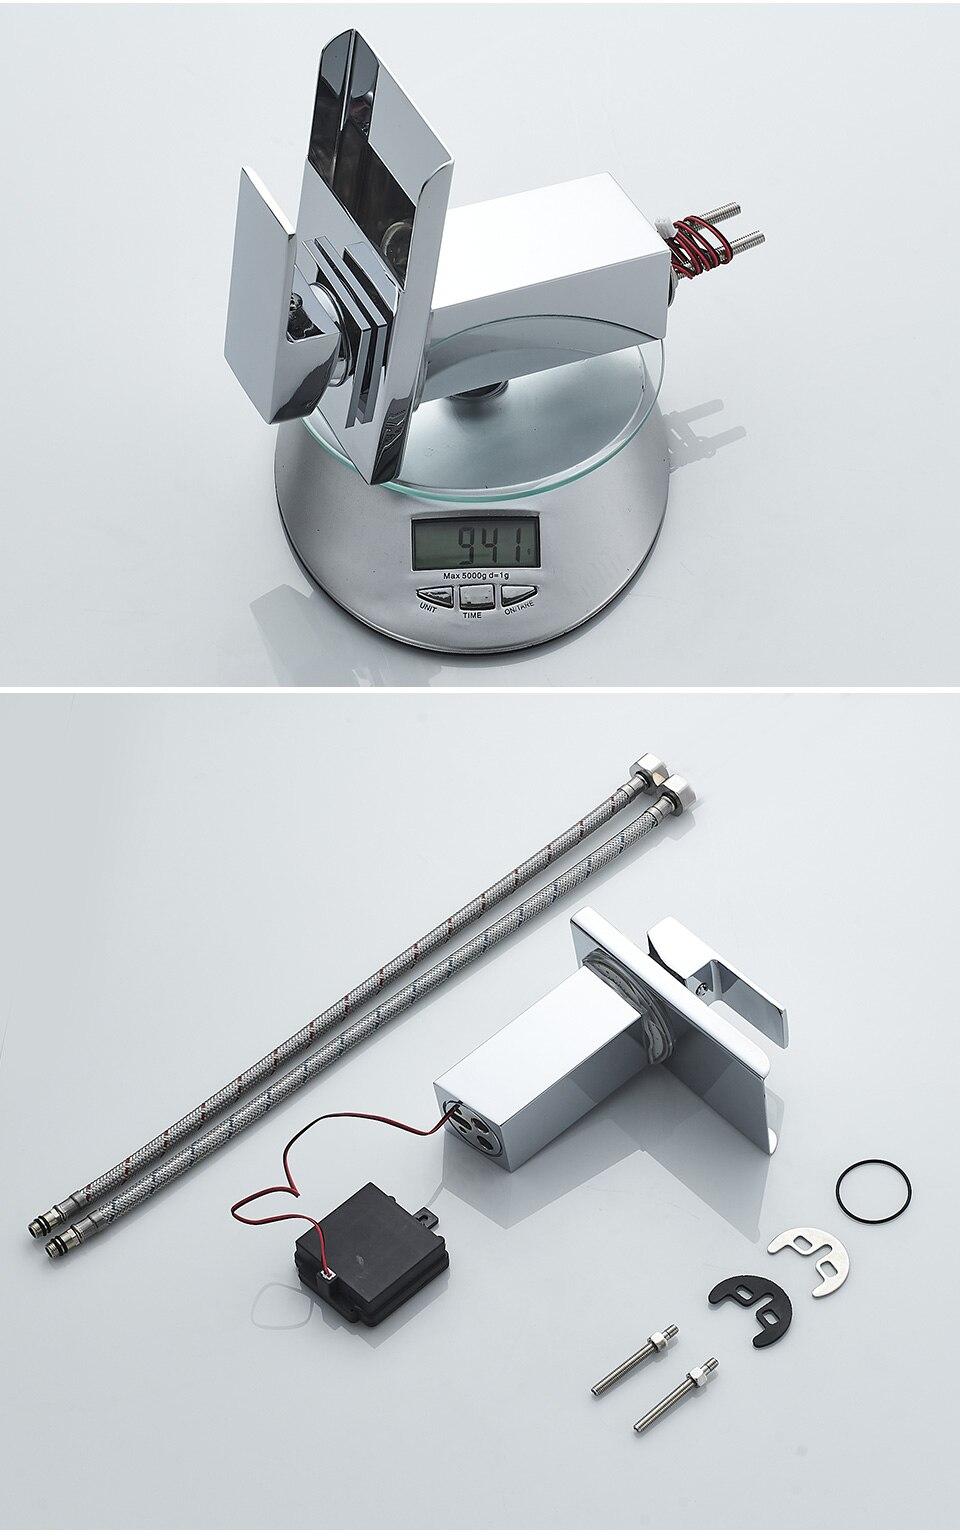 Ha705b8fa7cd242899b25db39302511906 ROVADE Bathroom LED Basin Faucet, Waterfall Bathroom Sink Tap Cold and Hot Mixer Crane (Chrome)